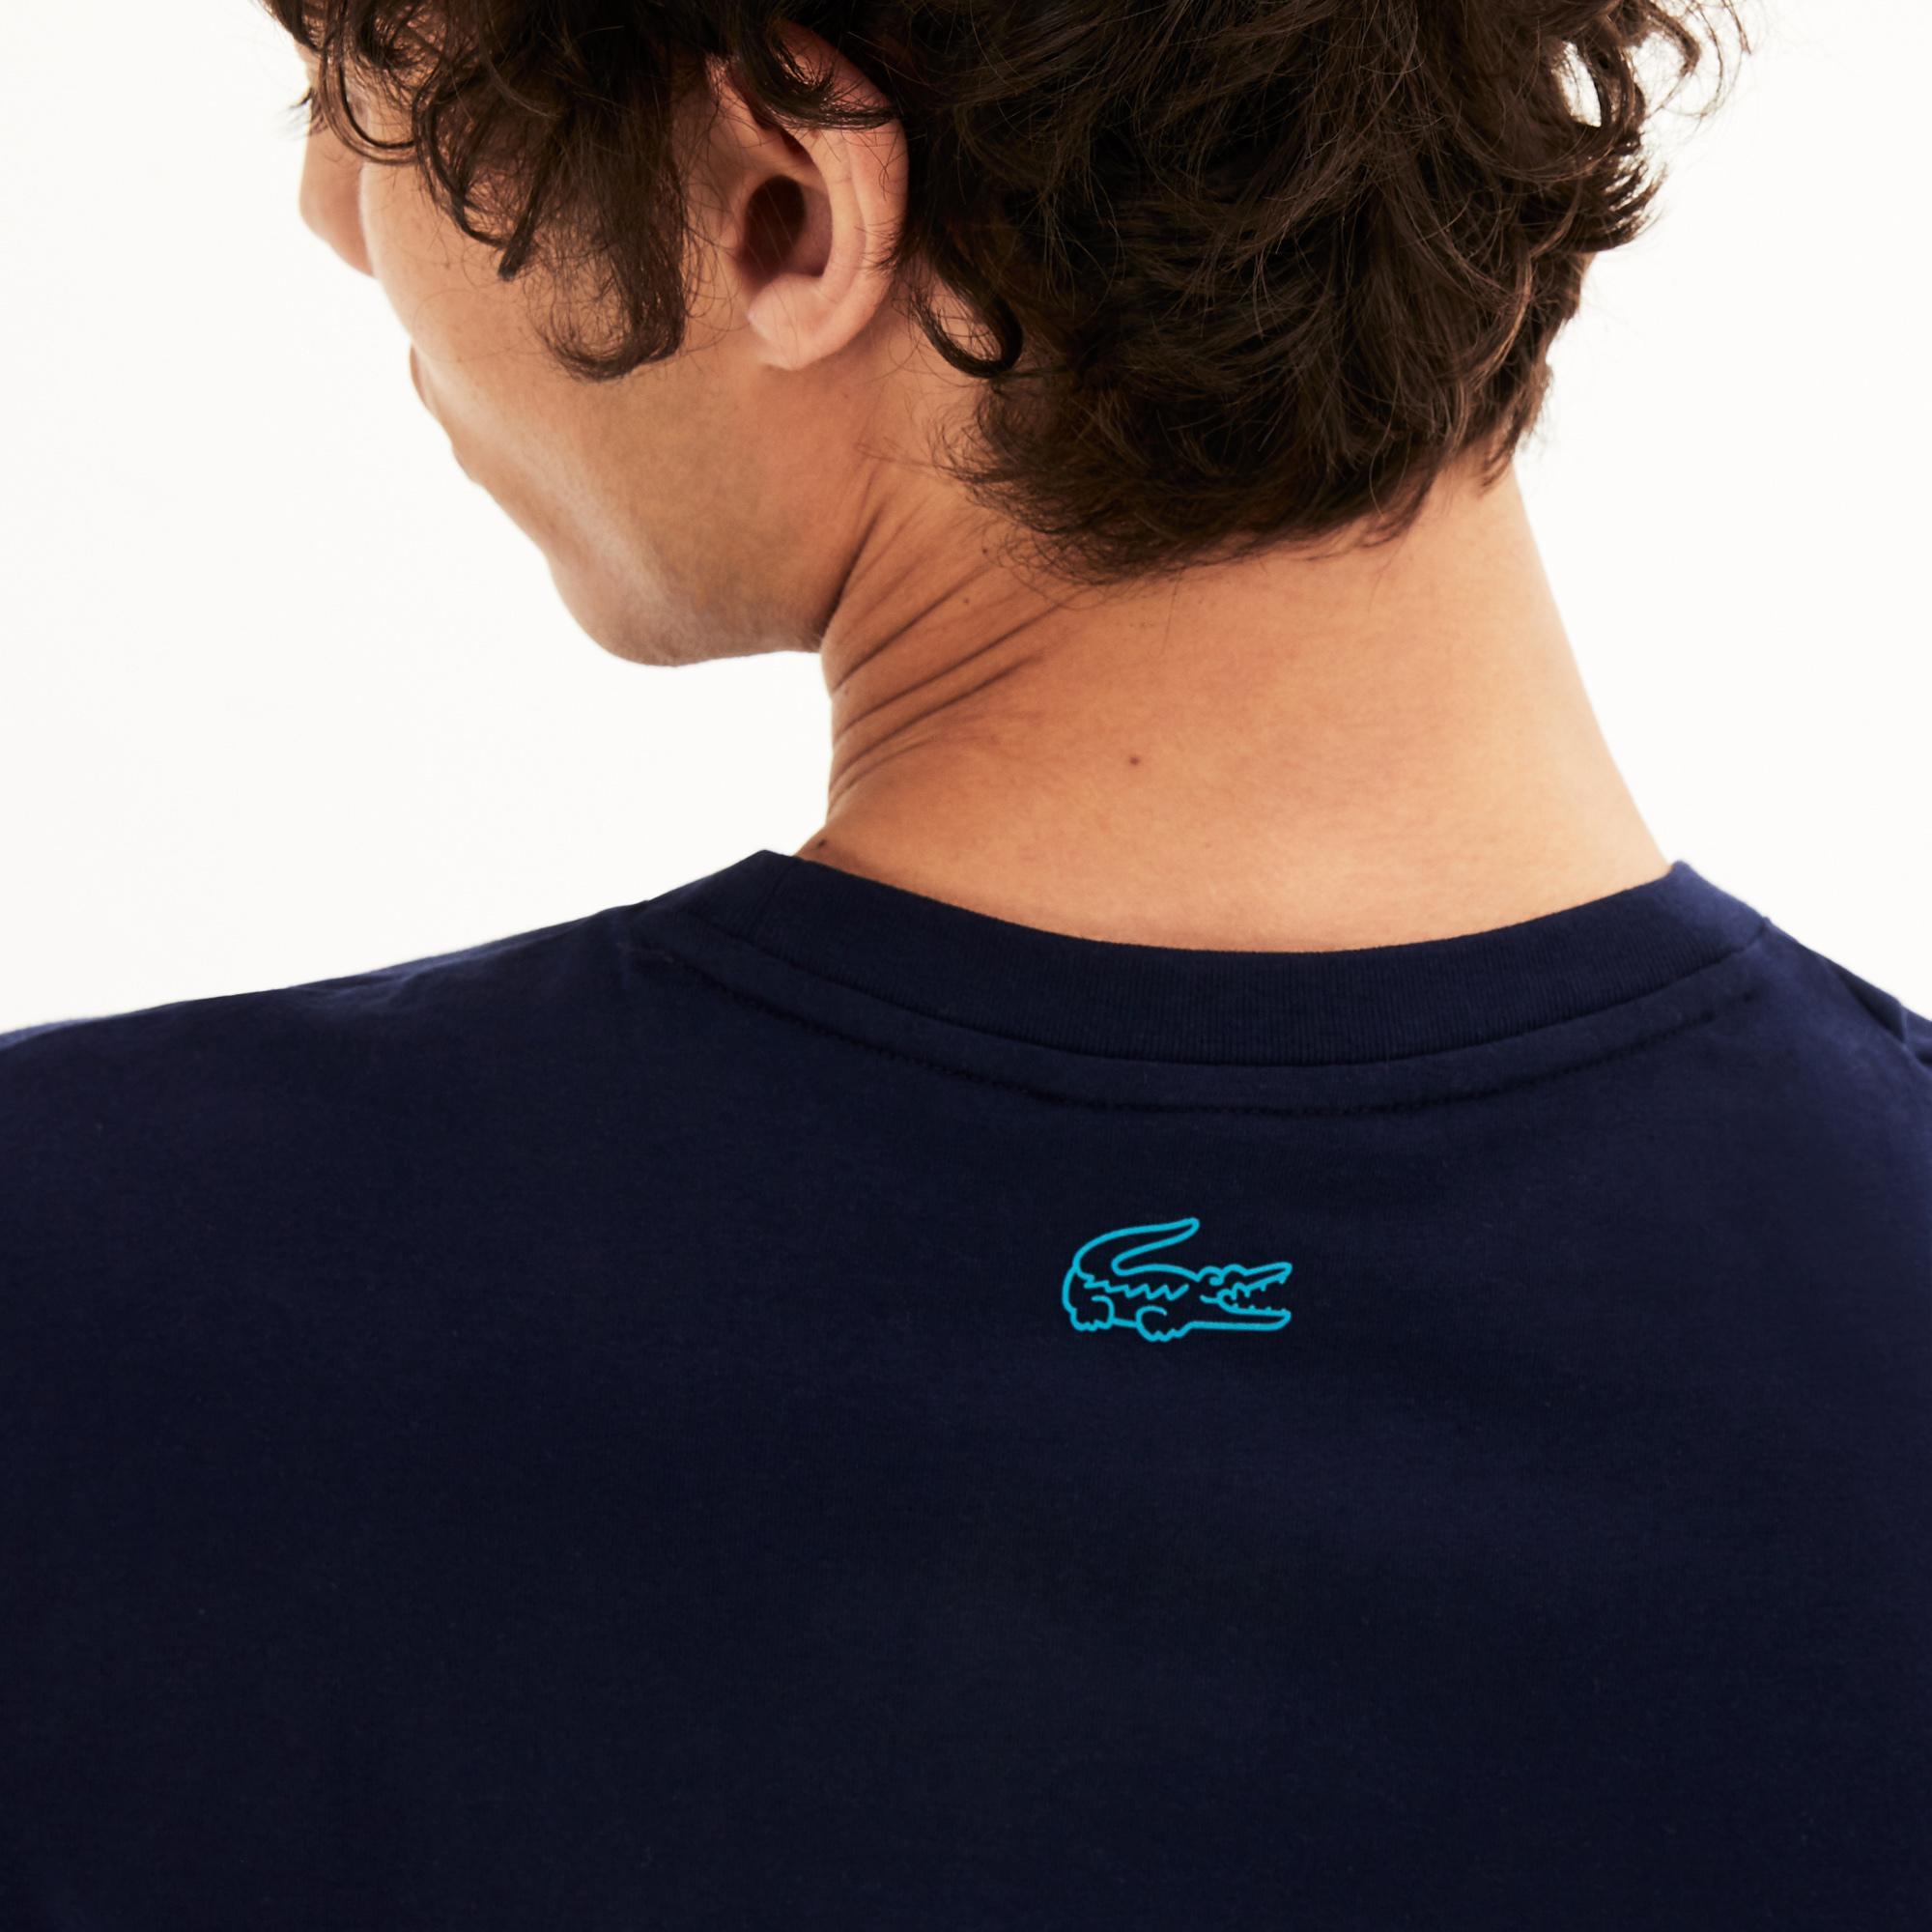 Lacoste Erkek Lacivert Bisiklet Yaka Baskılı T-Shirt